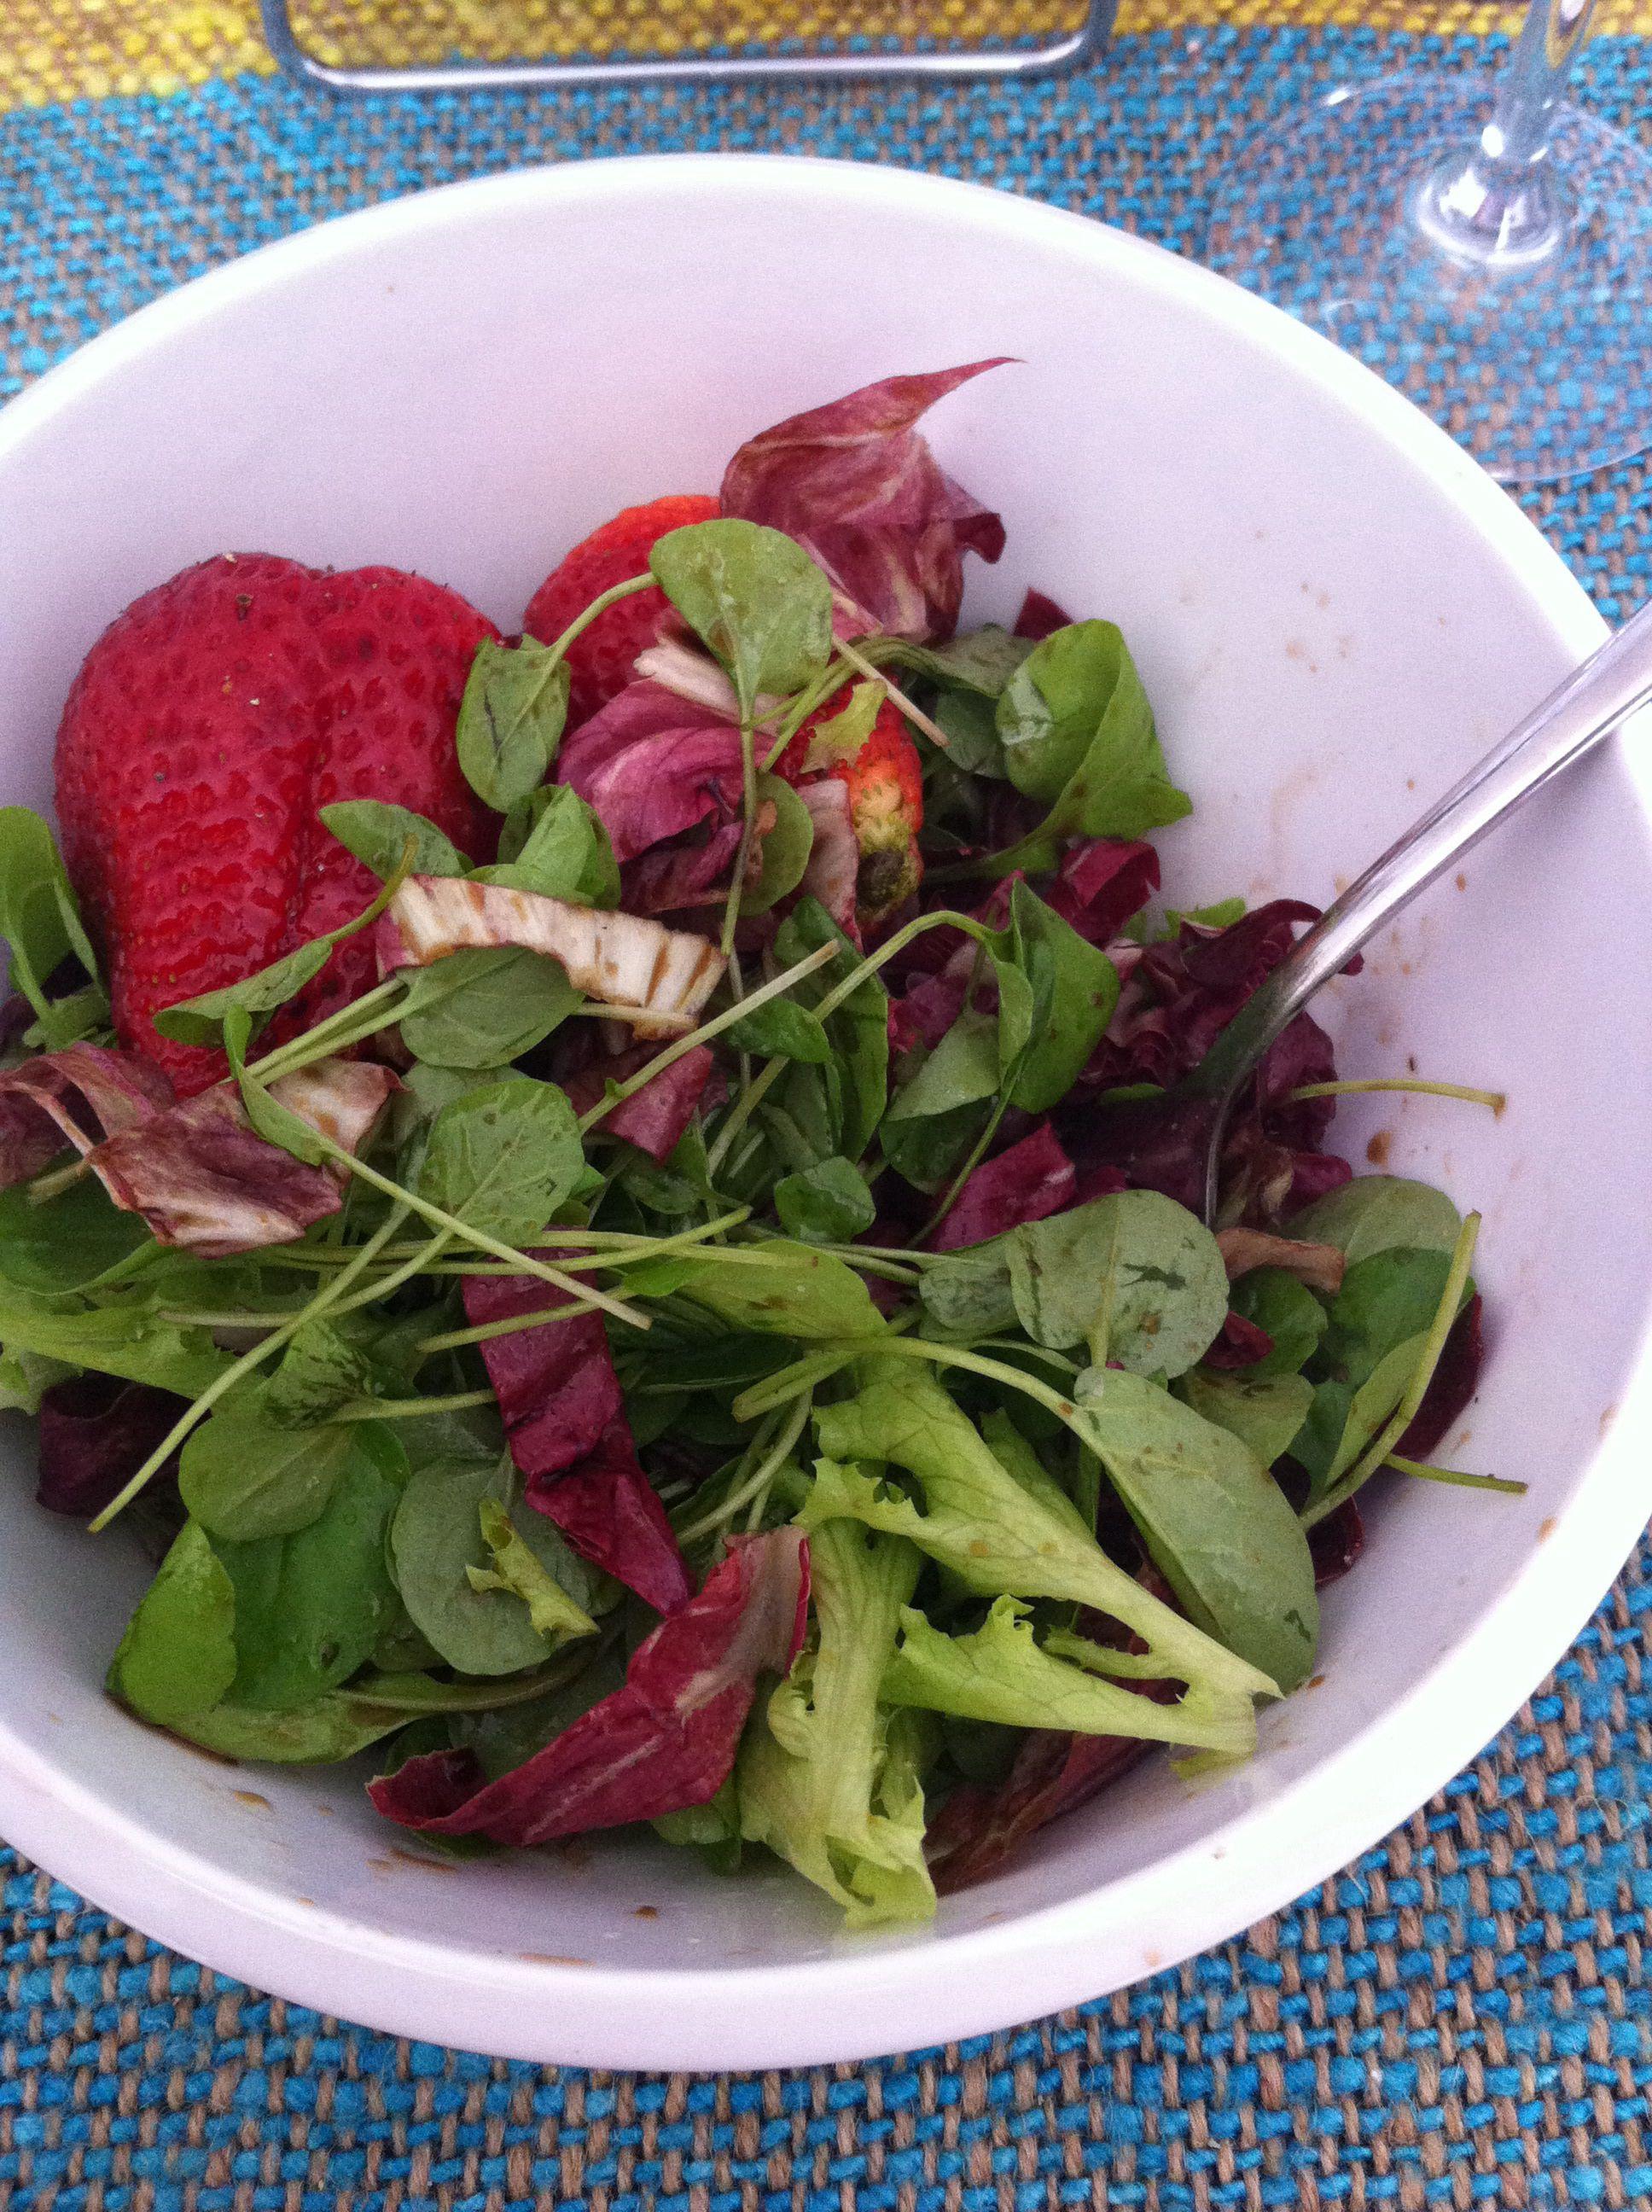 Baby leaf mix salad w strawberries